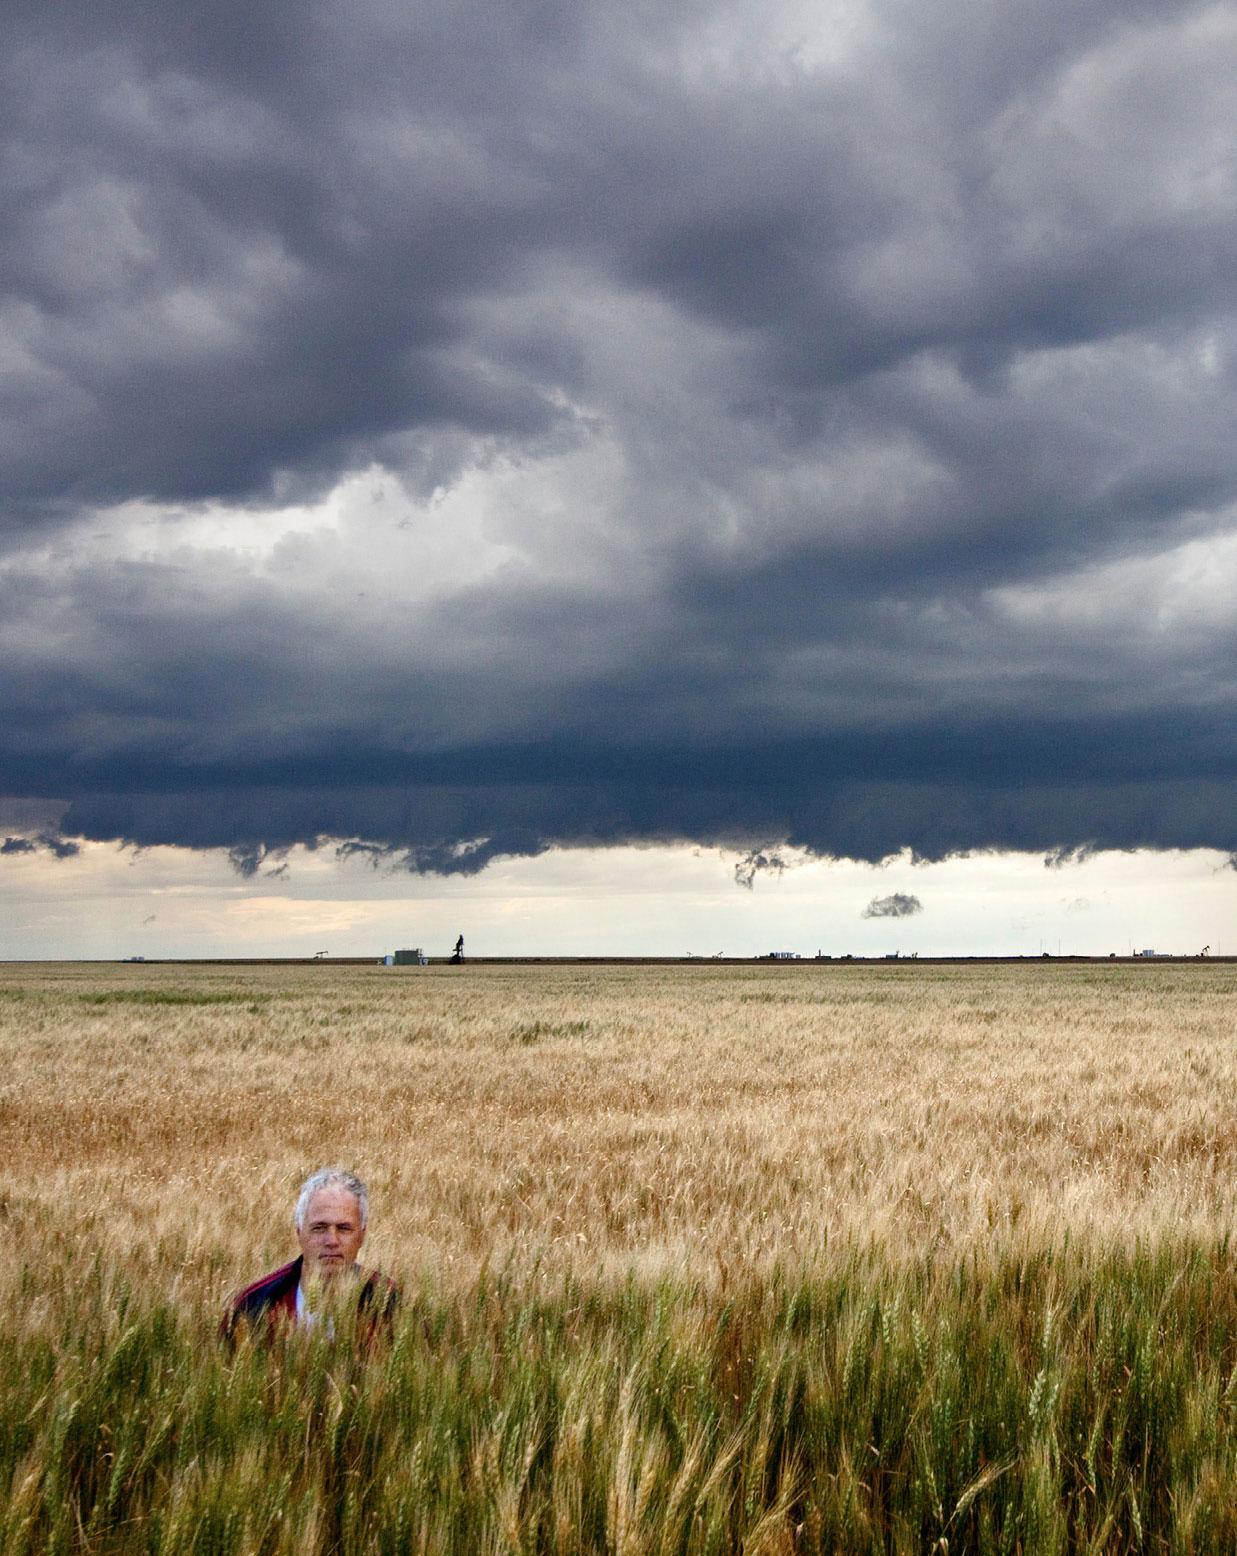 The Storm Hunt